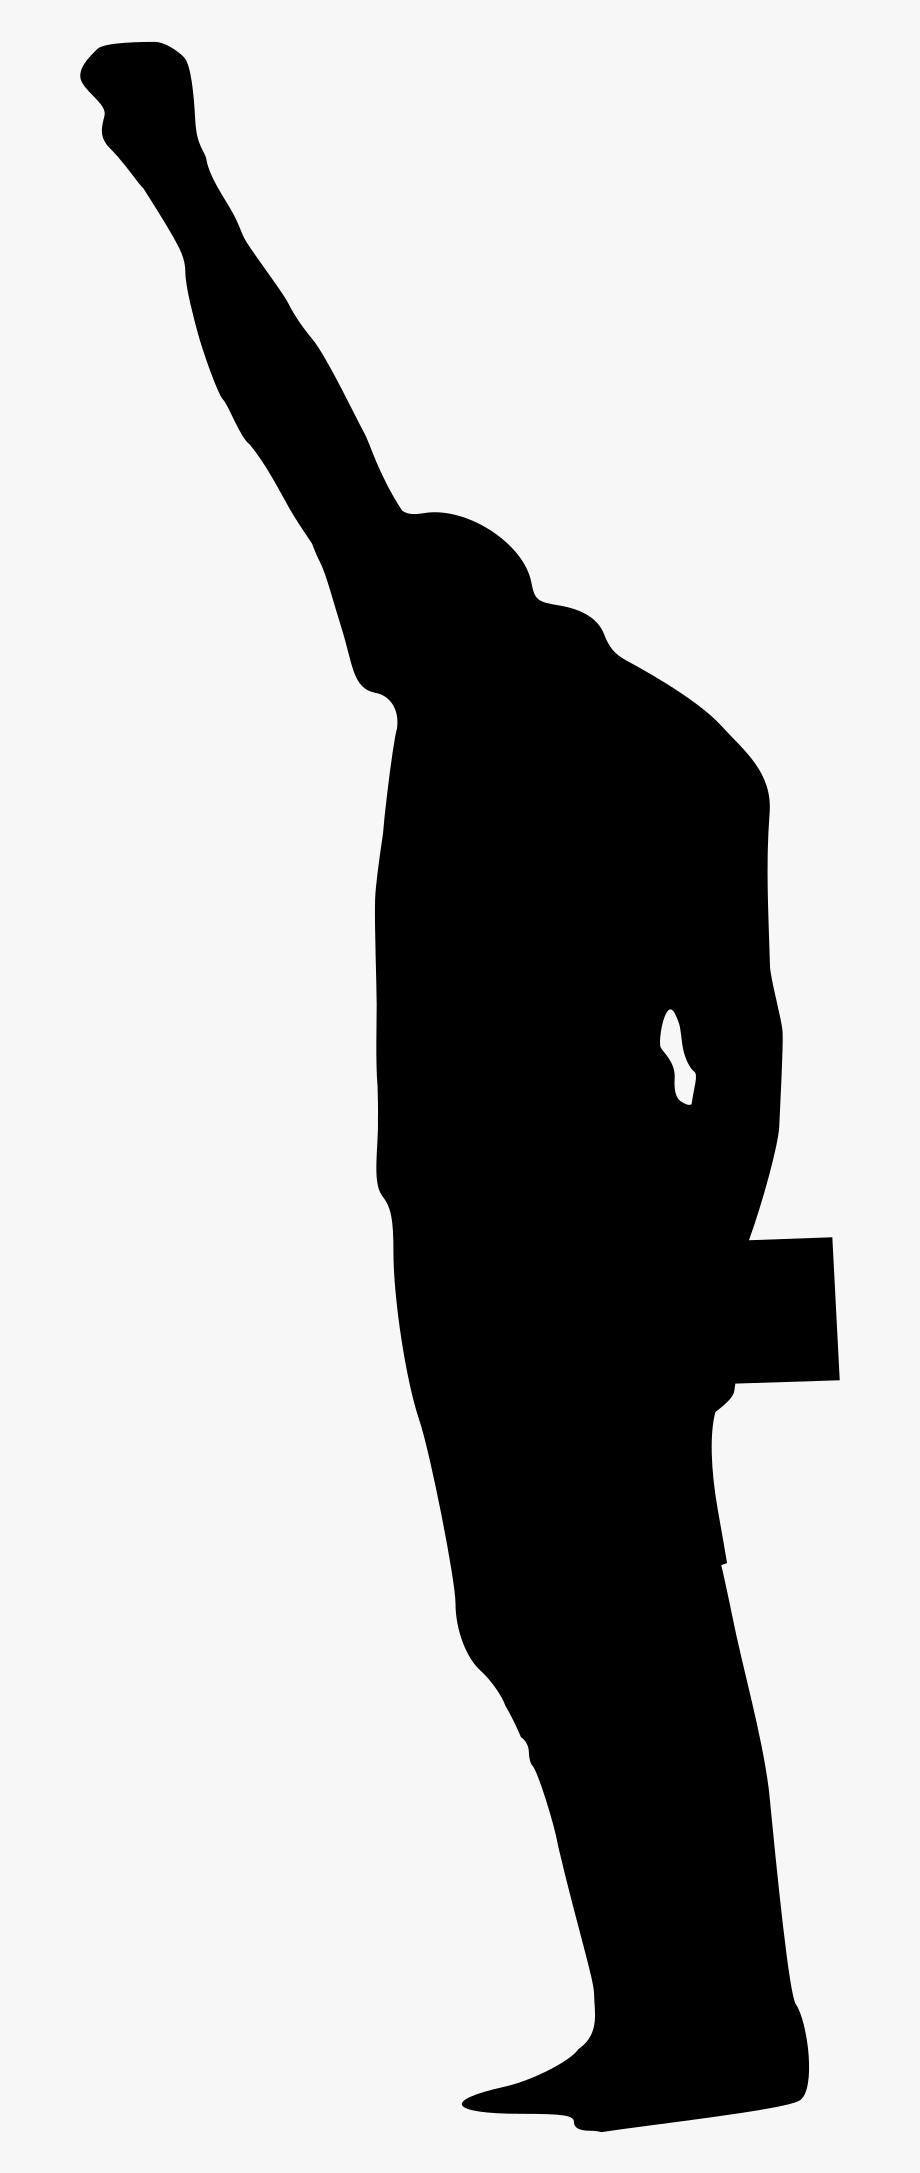 Fist clipart power to person. Black clip art silhouette